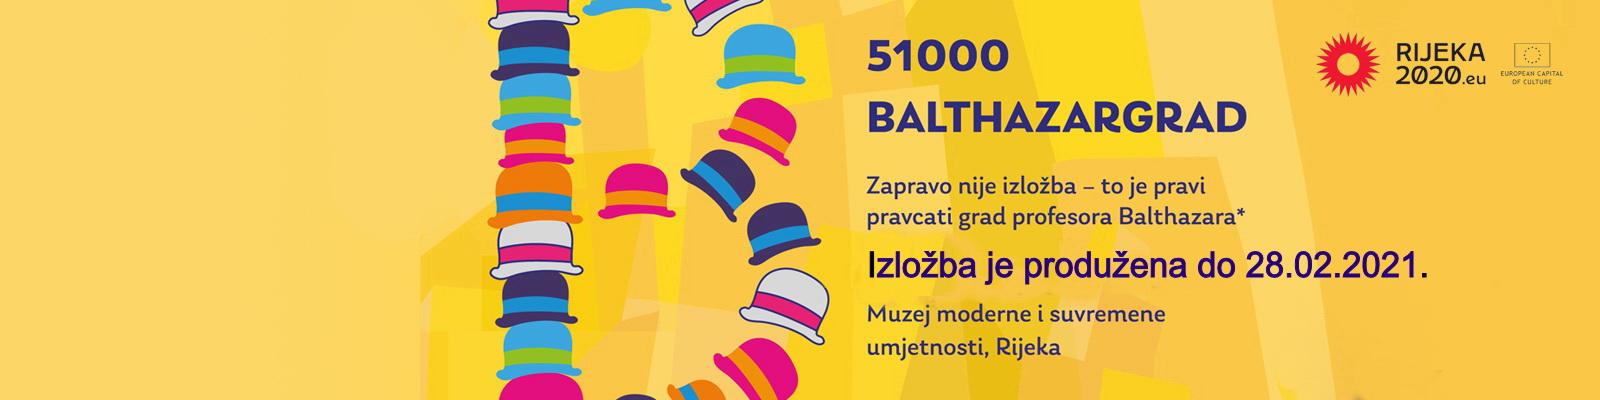 Izložba 51000 Balthazargrad